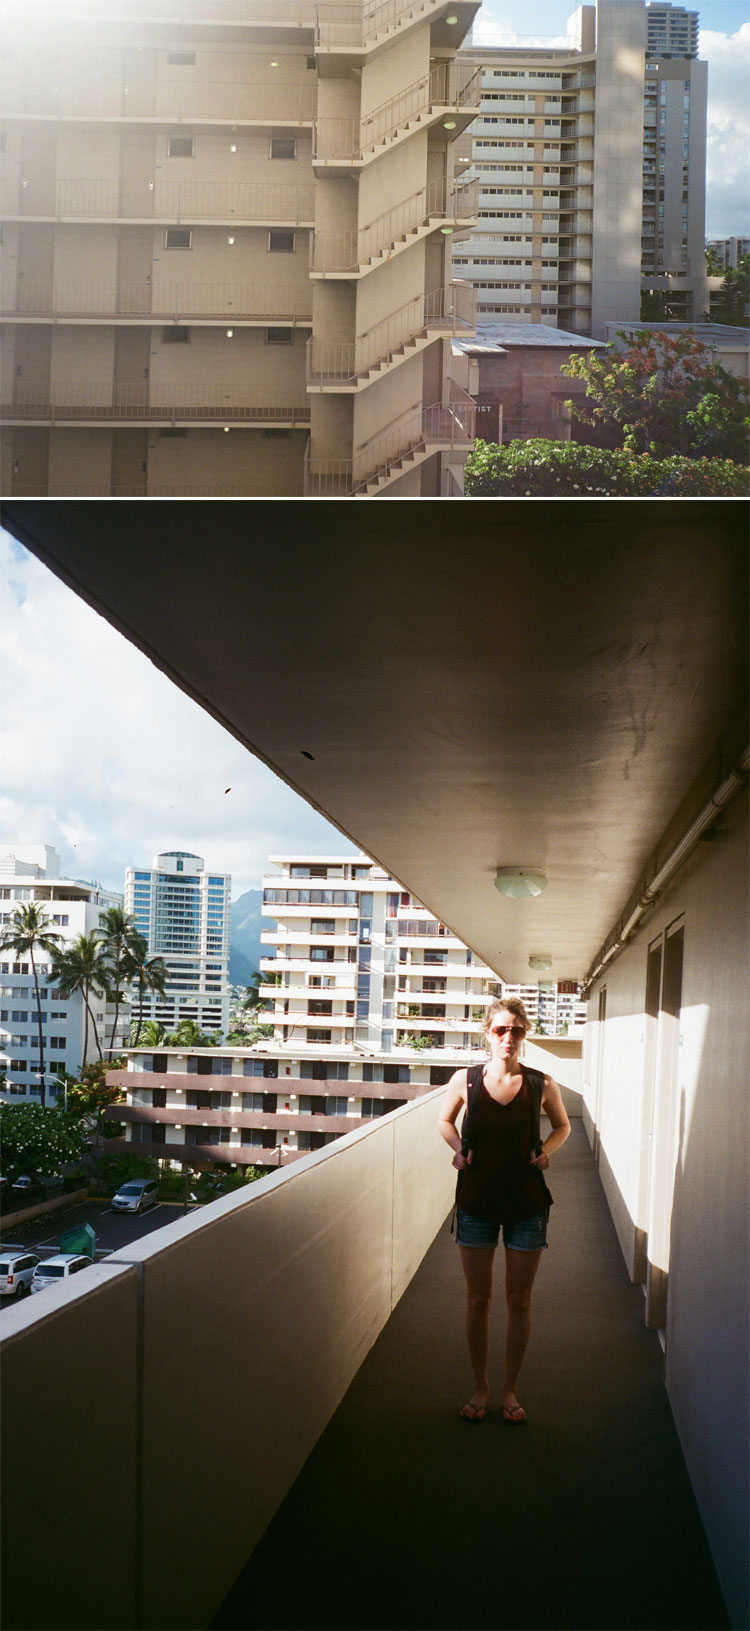 Oahu-3.jpg